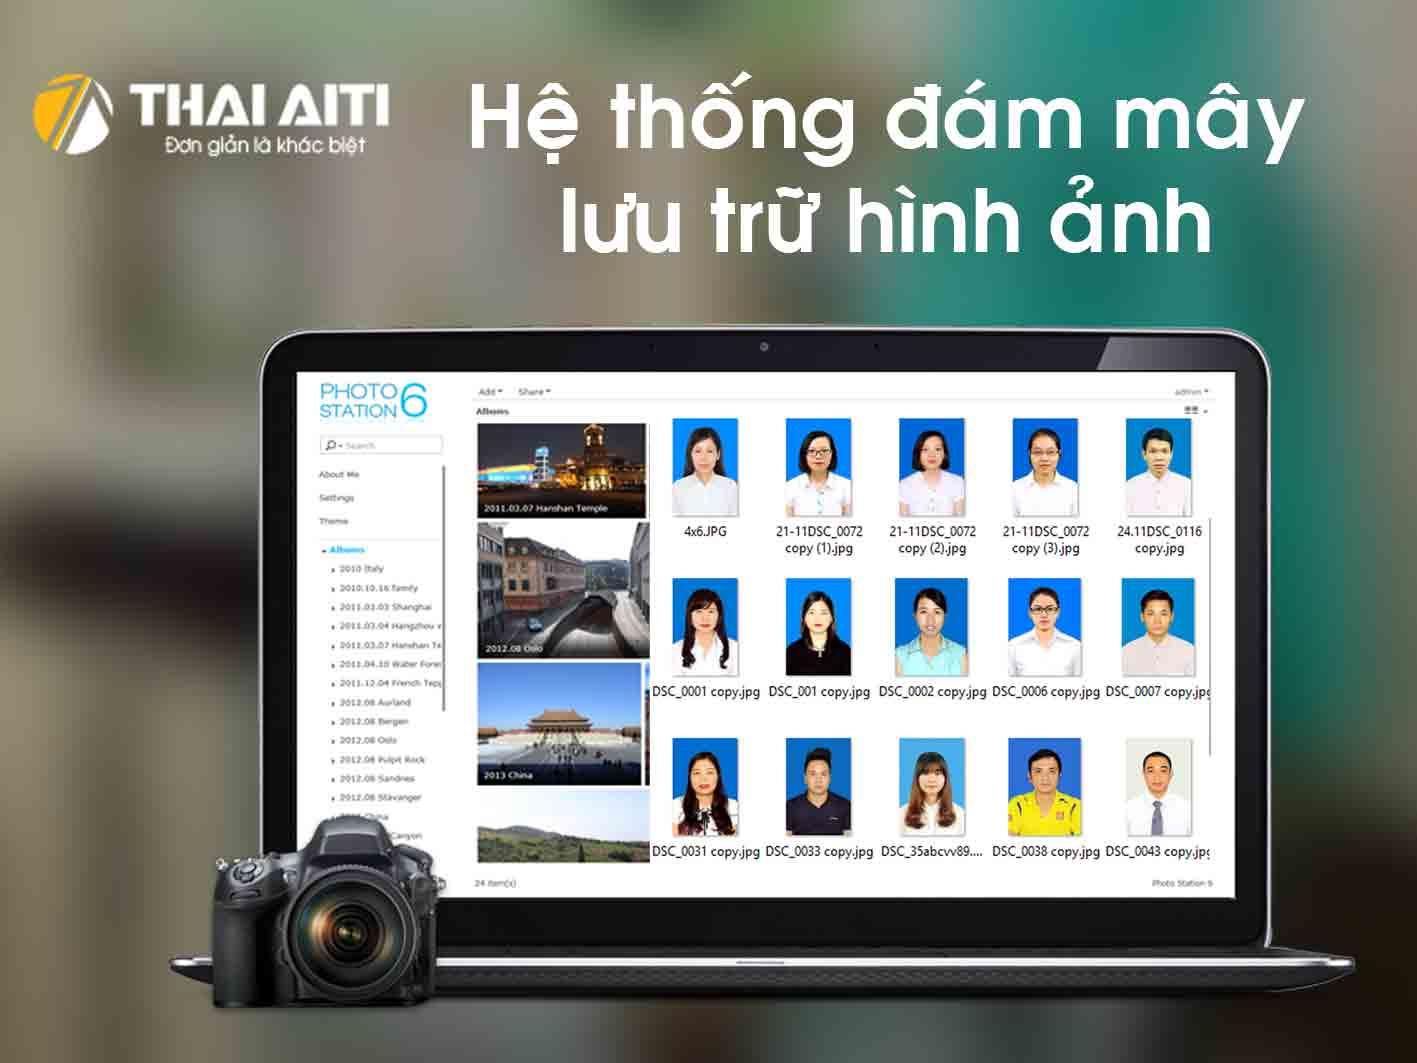 thai aiti studio ra mat kho luu tru anh cho khach hang 10267